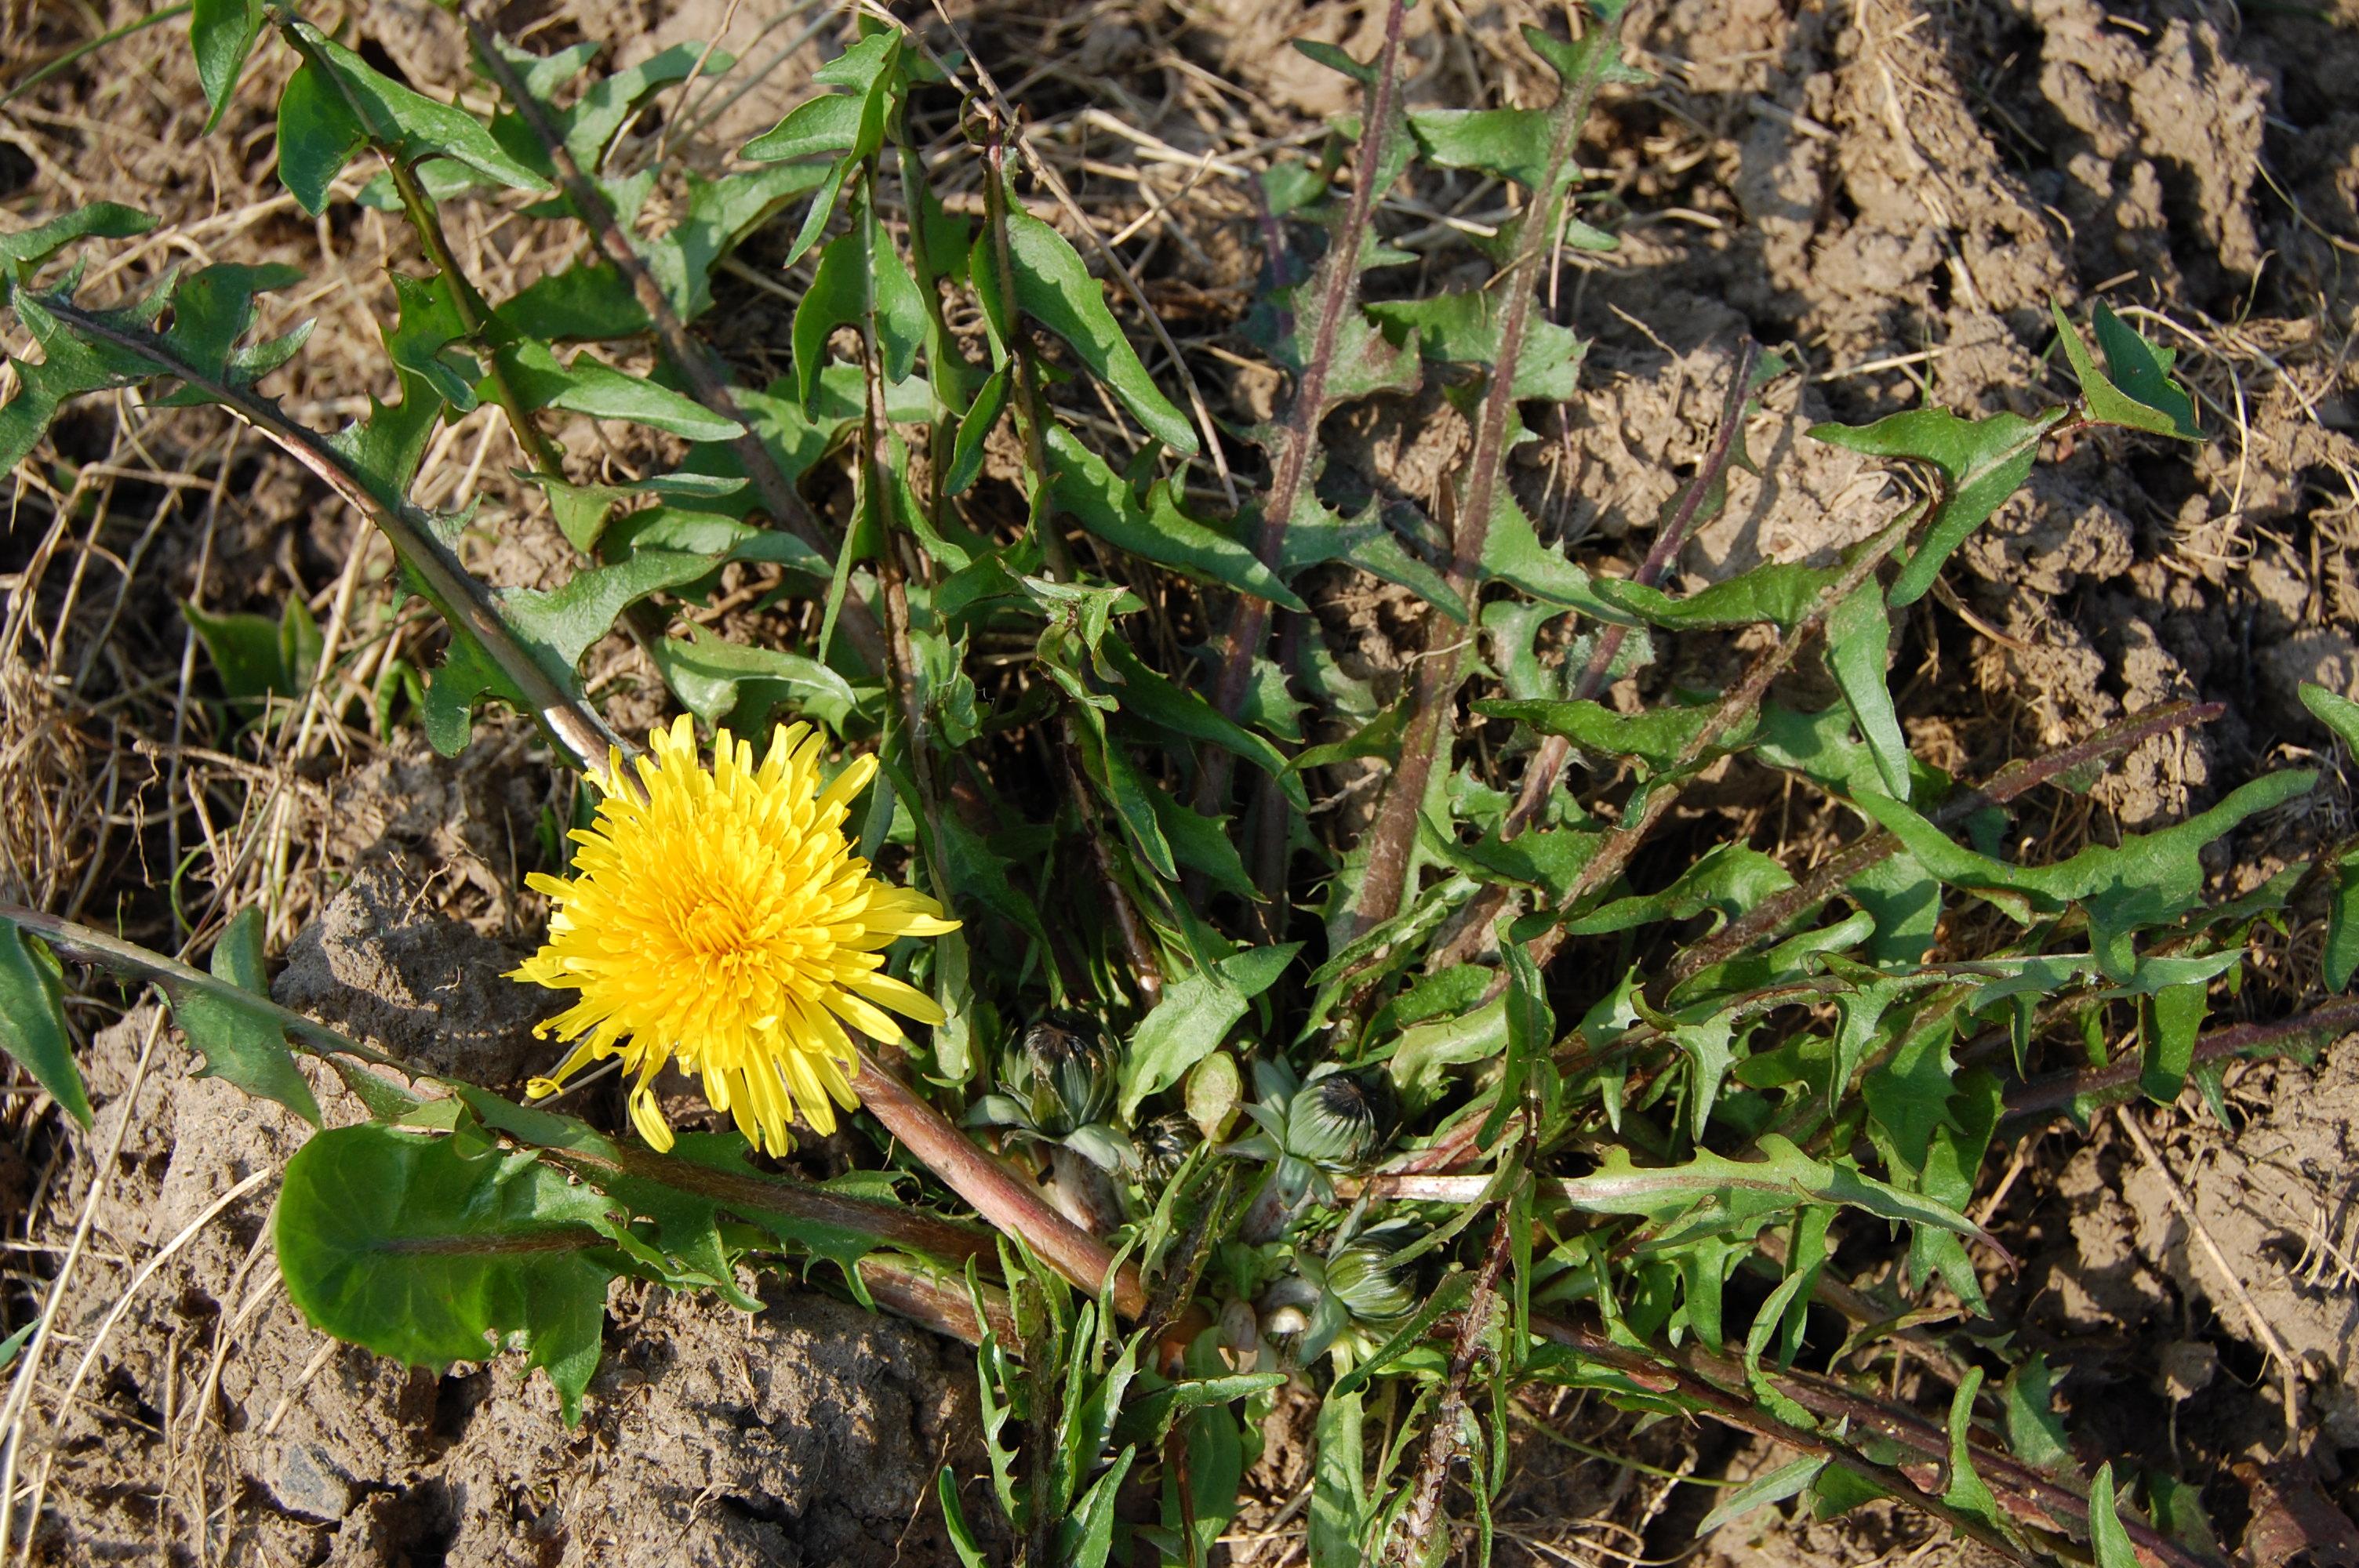 https://pictures.bgbm.org/digilib/Scaler?fn=Cichorieae/Taraxacum_lamprophyllum_A_01.jpg&mo=file